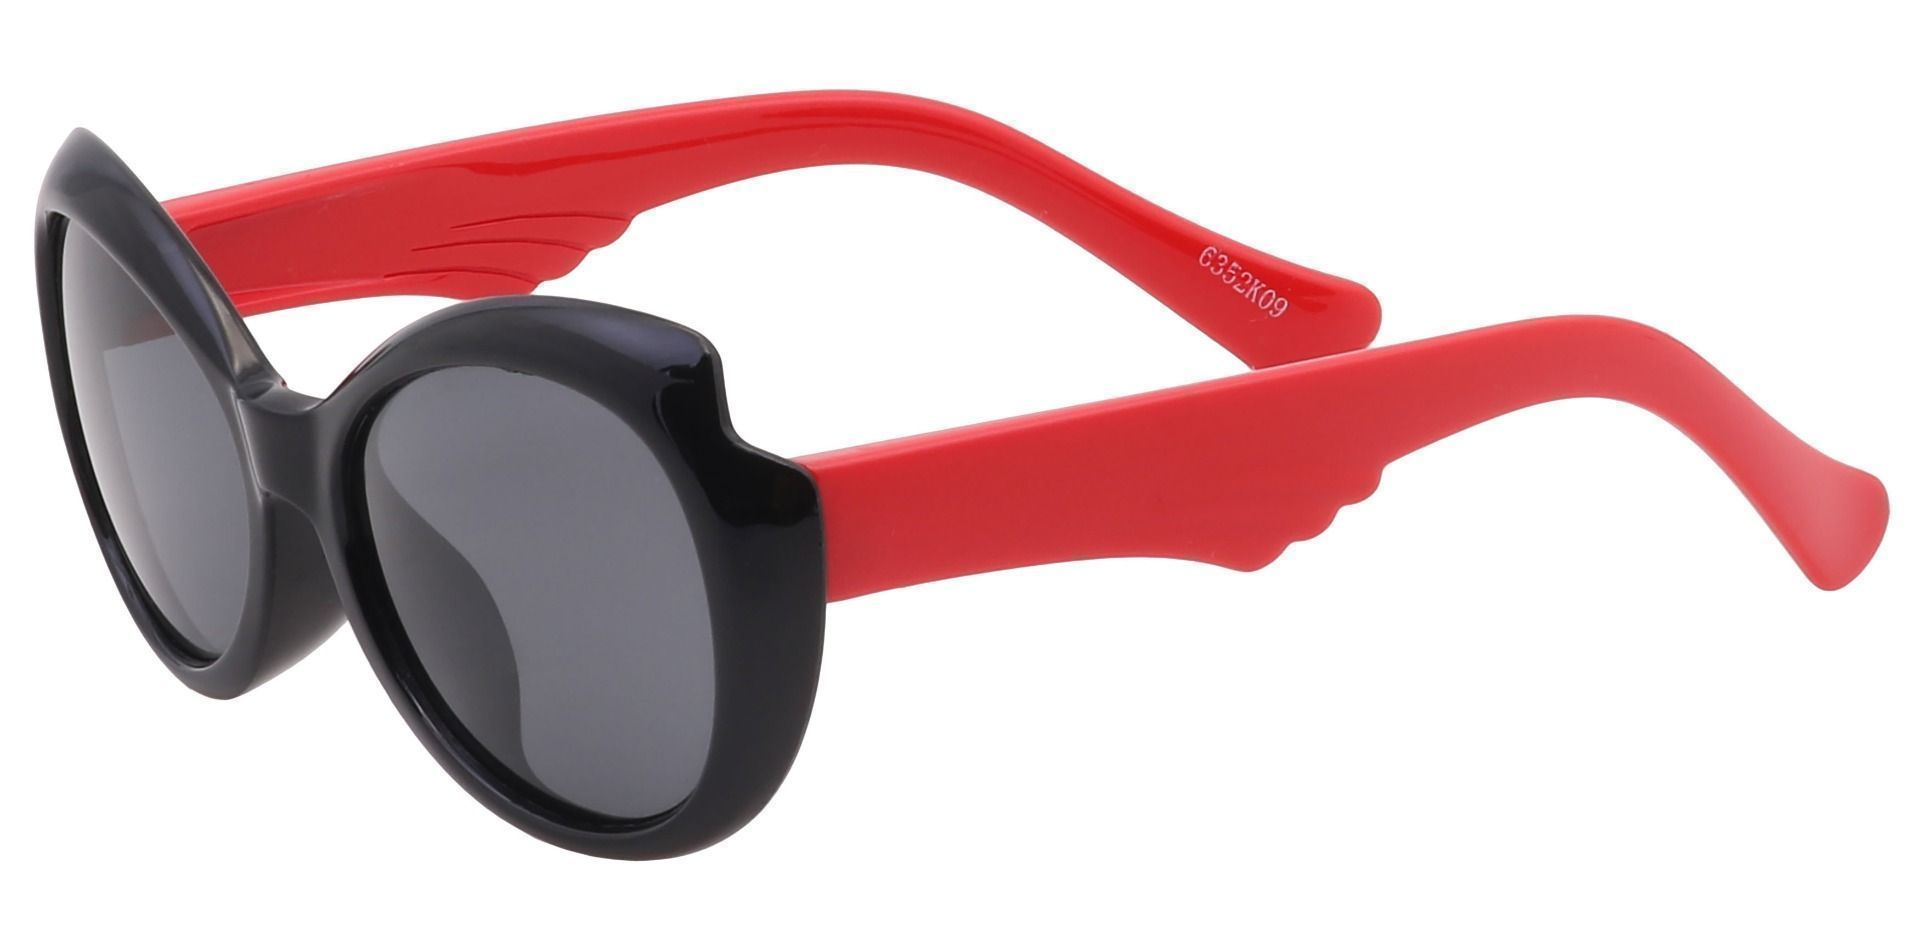 Robin Oval Single Vision Sunglasses - Black Frame With Gray Lenses